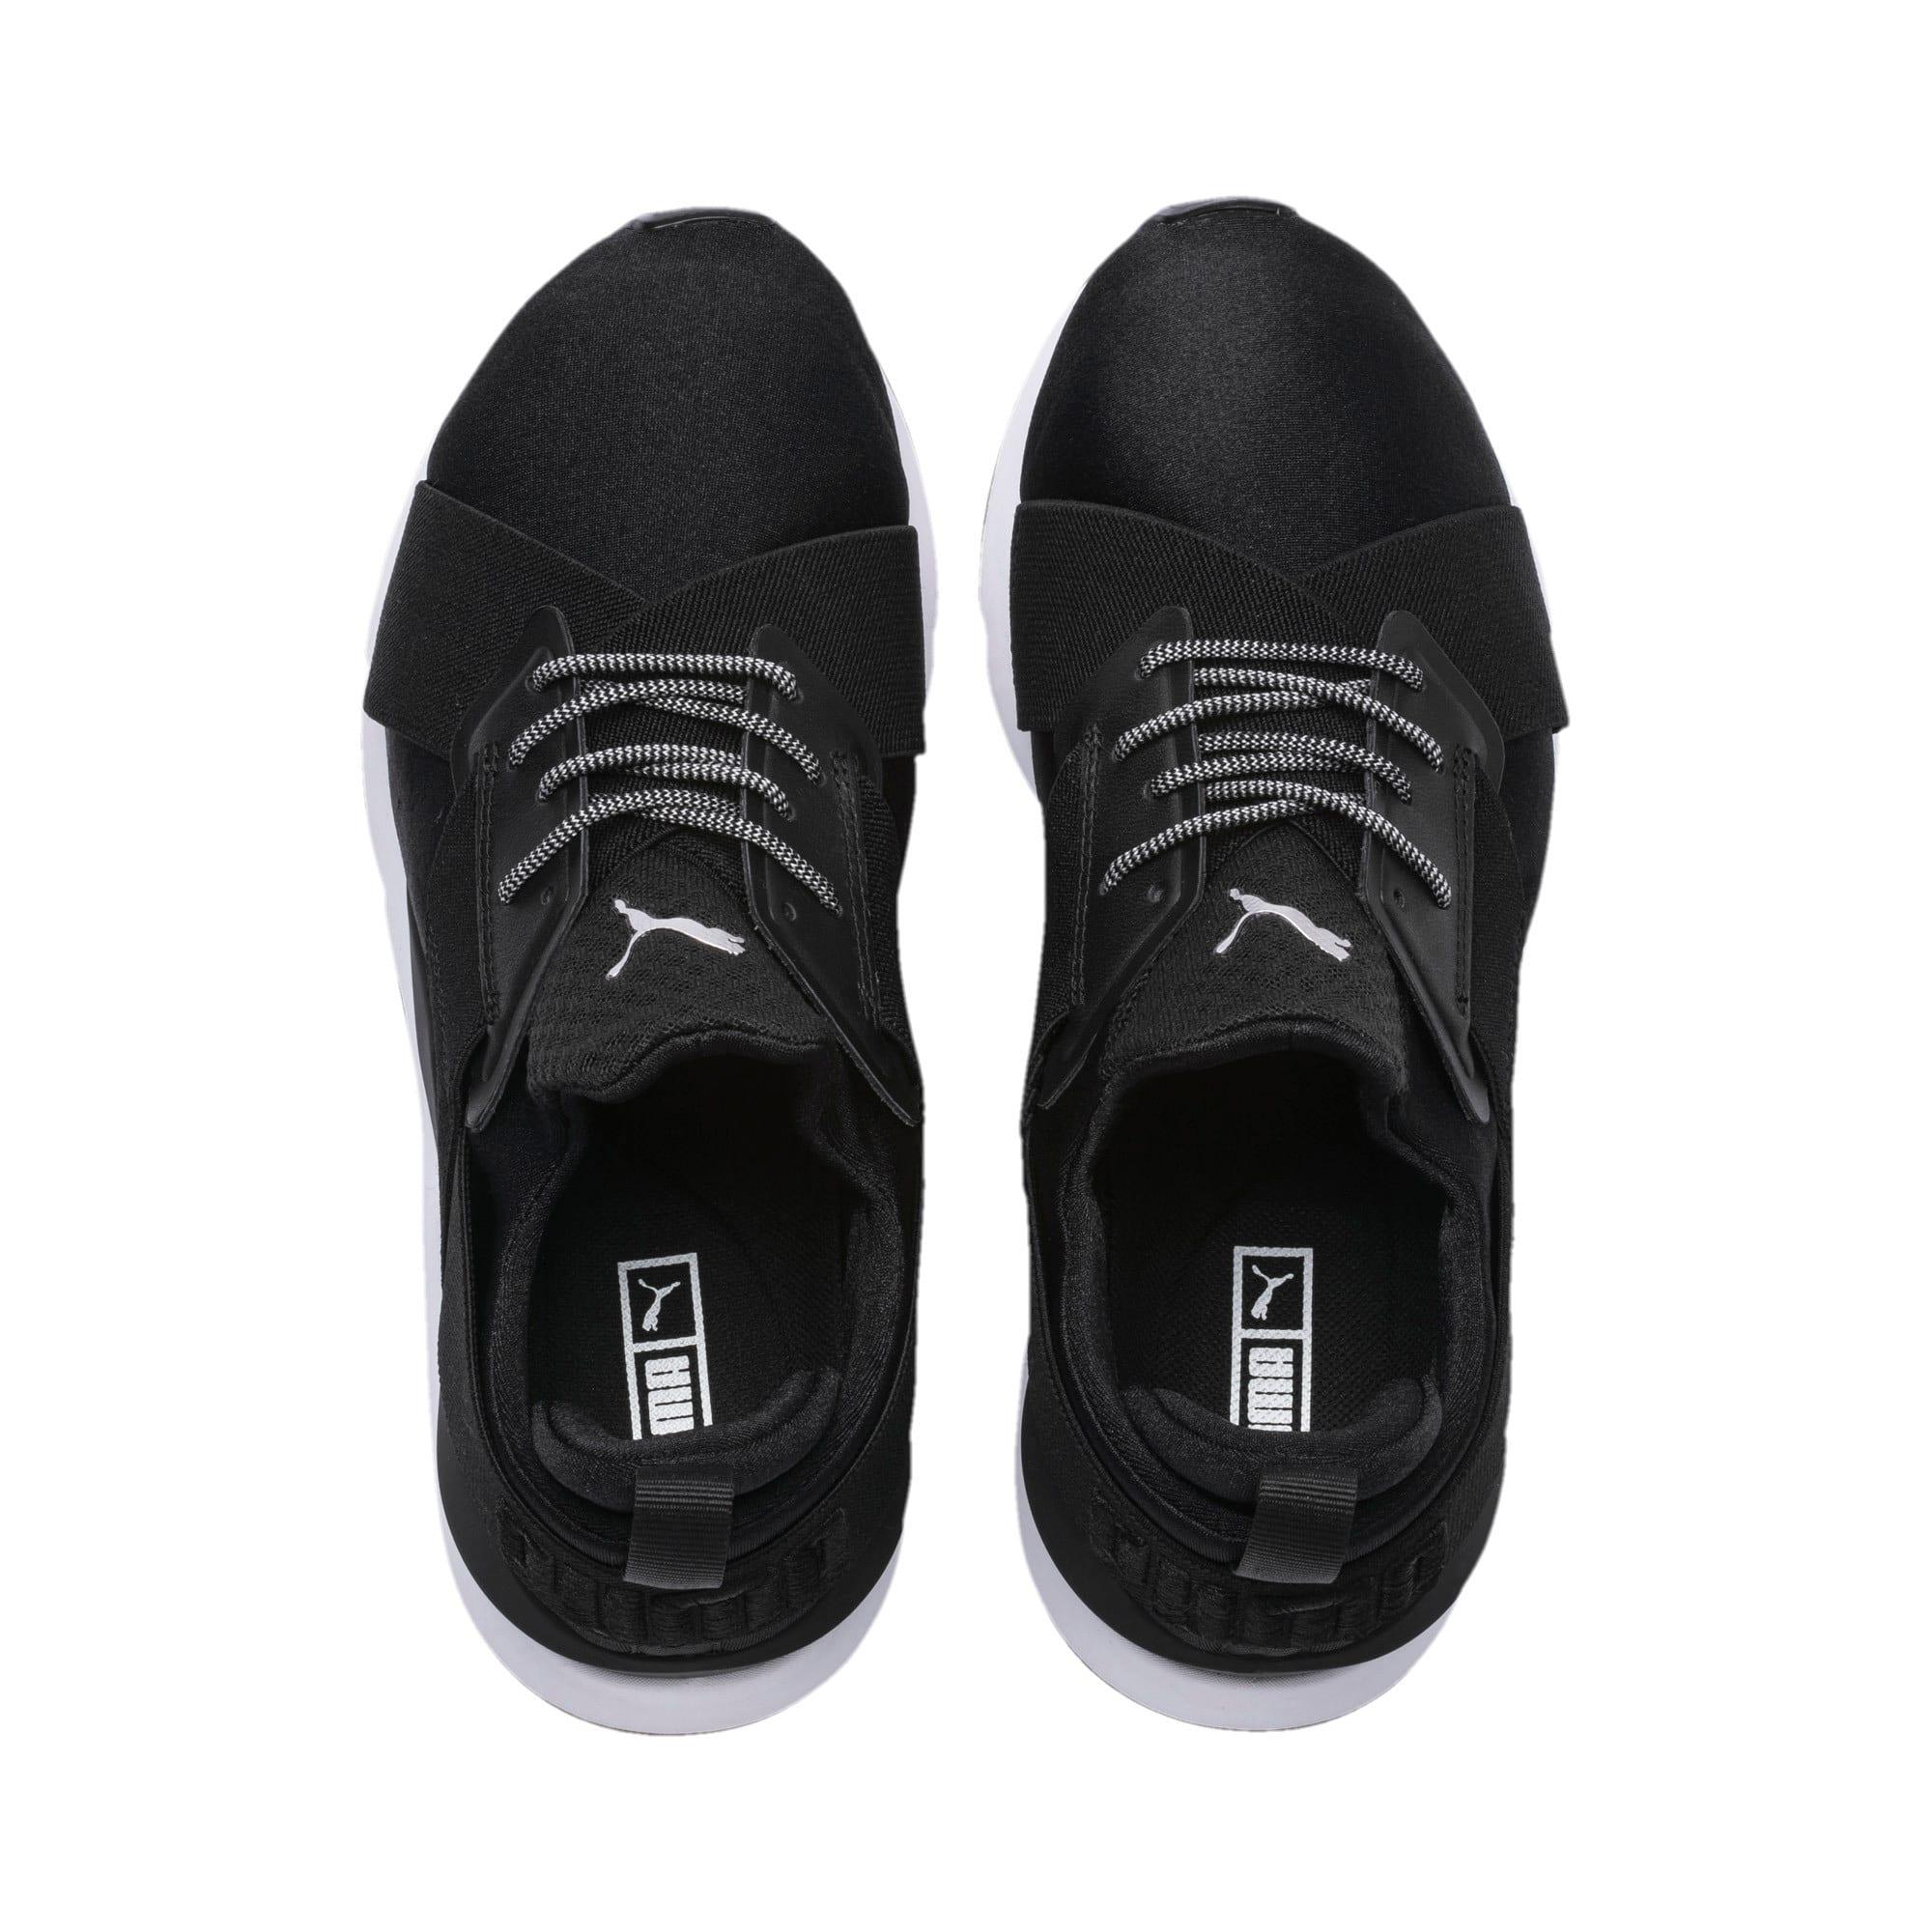 Thumbnail 6 of En Pointe Muse Satin Women's Sneakers, Puma Black-Puma White, medium